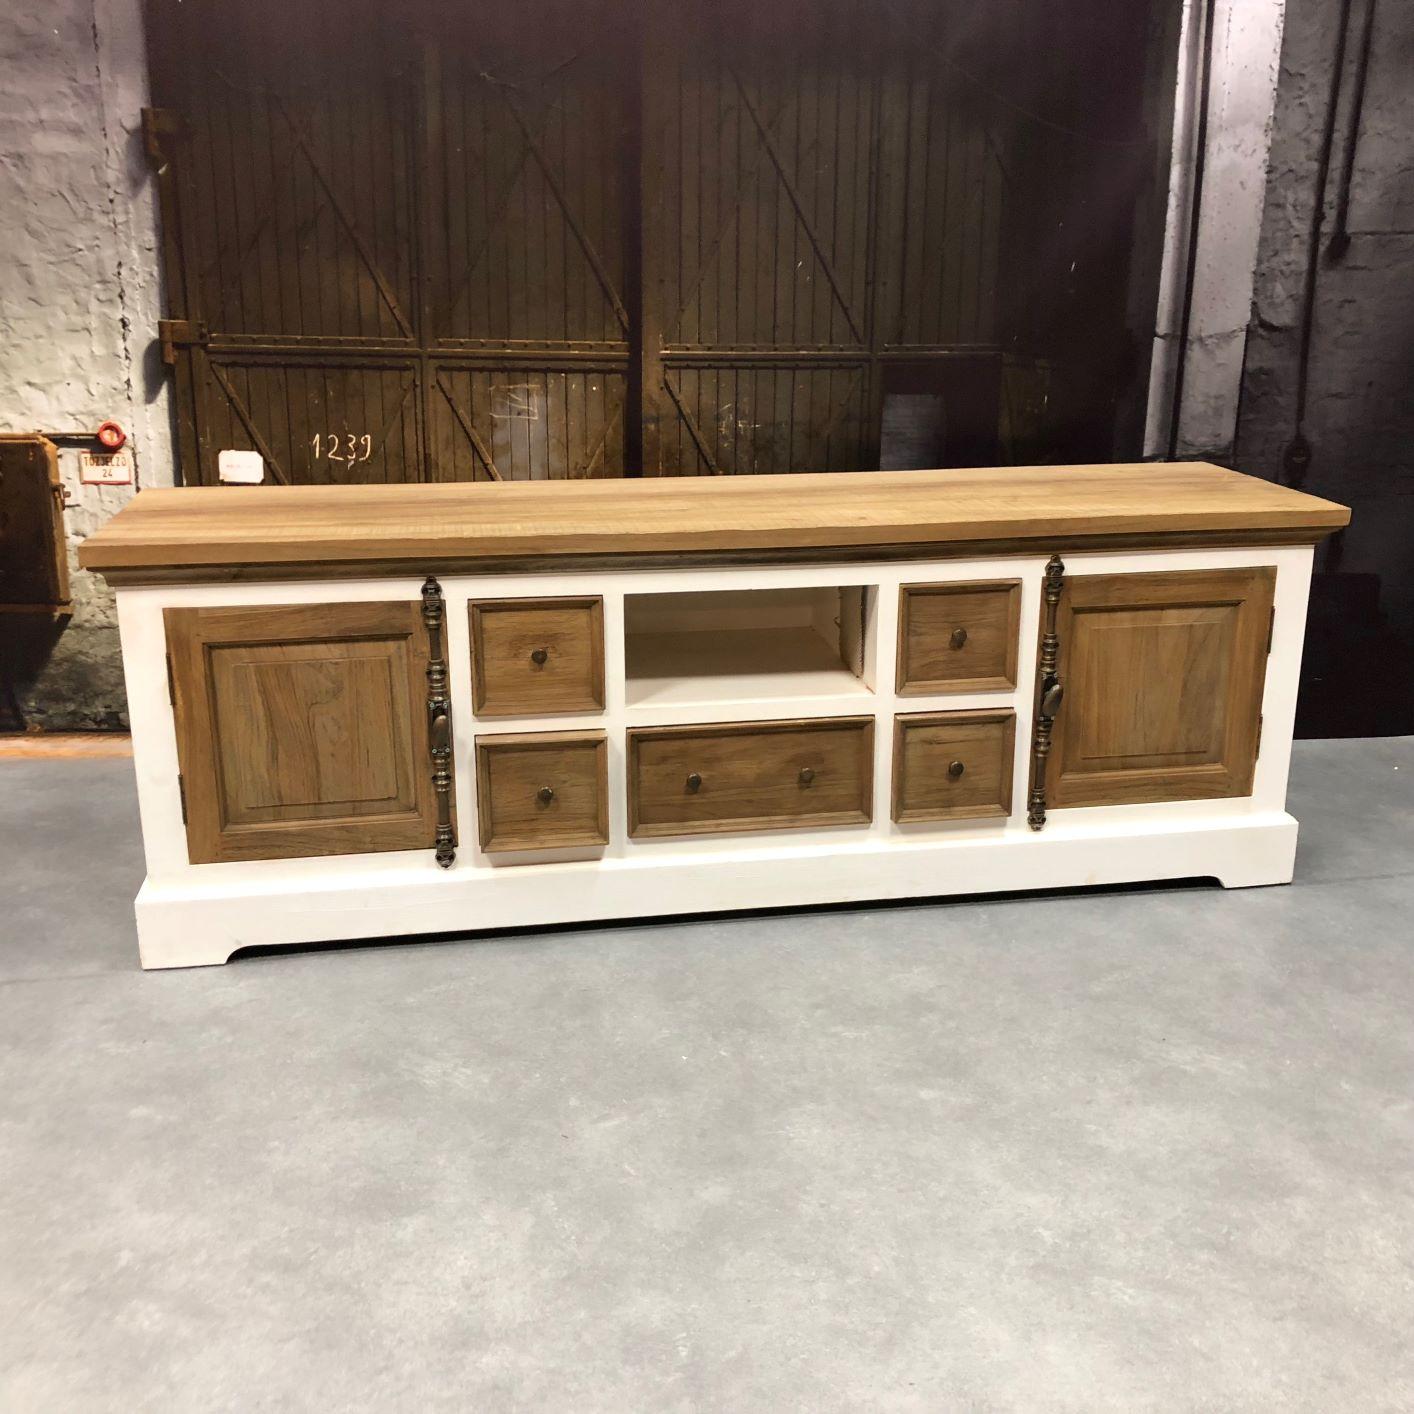 Groot Landelijk Tv Meubel.Tv Furniture Didi Large Teak Tv Furniture White Best Rates